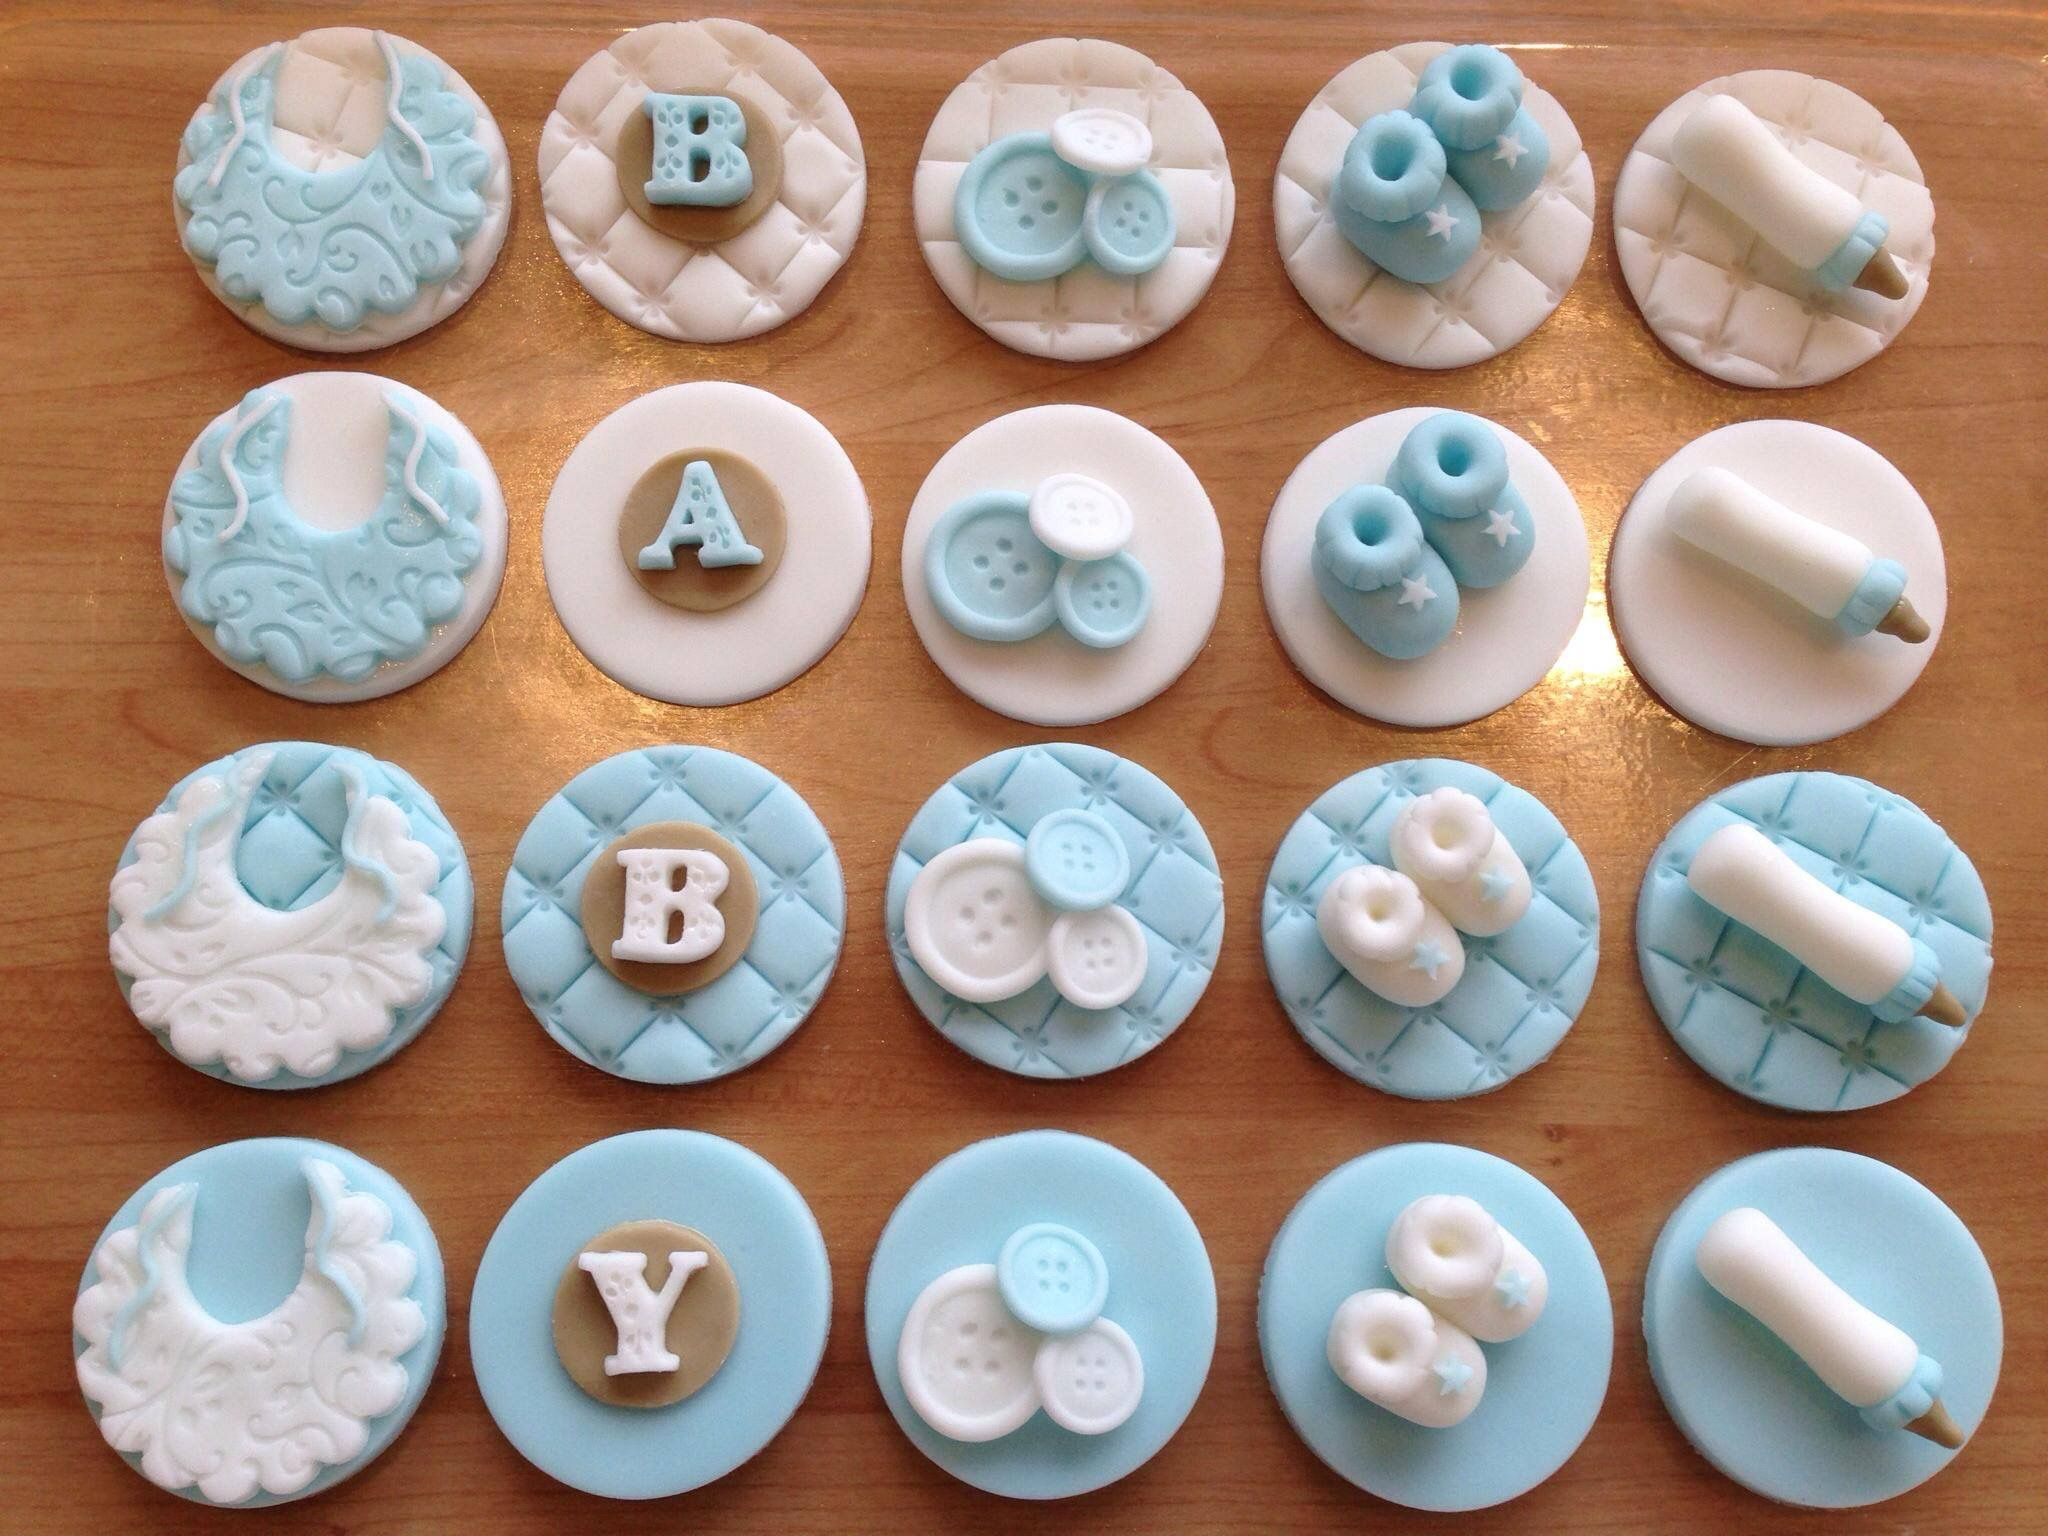 Cute Cake Baby Shower Cupcake Per Ideas Baby Shower Cupcake Ideas A Boy Baby Shower Cupcake Cupcake Shower Baby Fondant Baby Newborn Pin By Nancy On Cake Pinterest Cake Pops